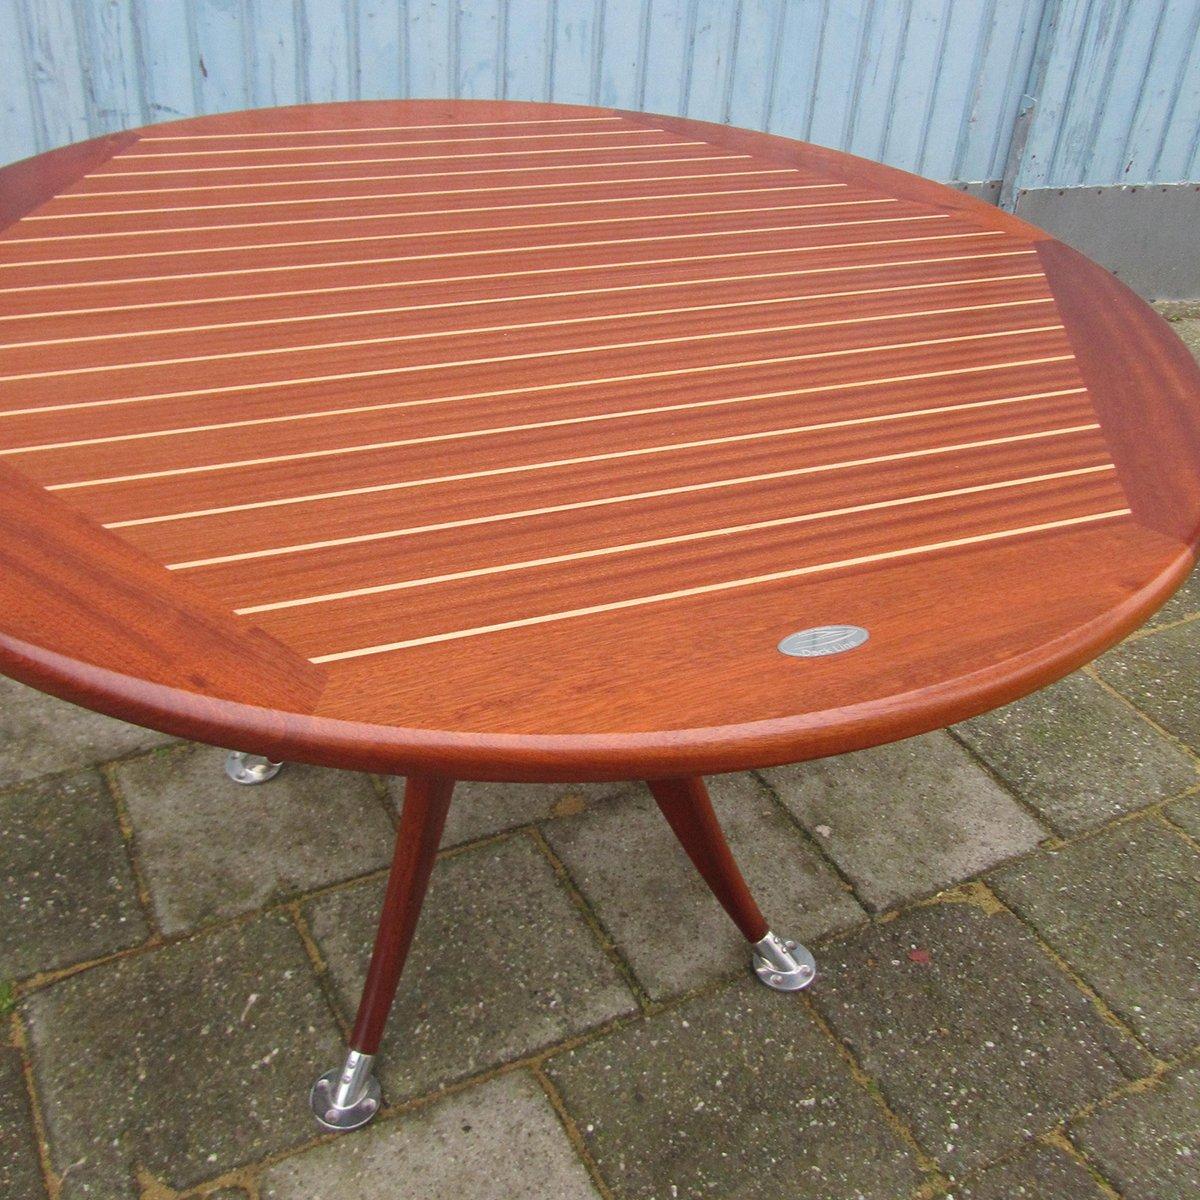 tavolo da giardino rotondo allungabile vintage di deckline